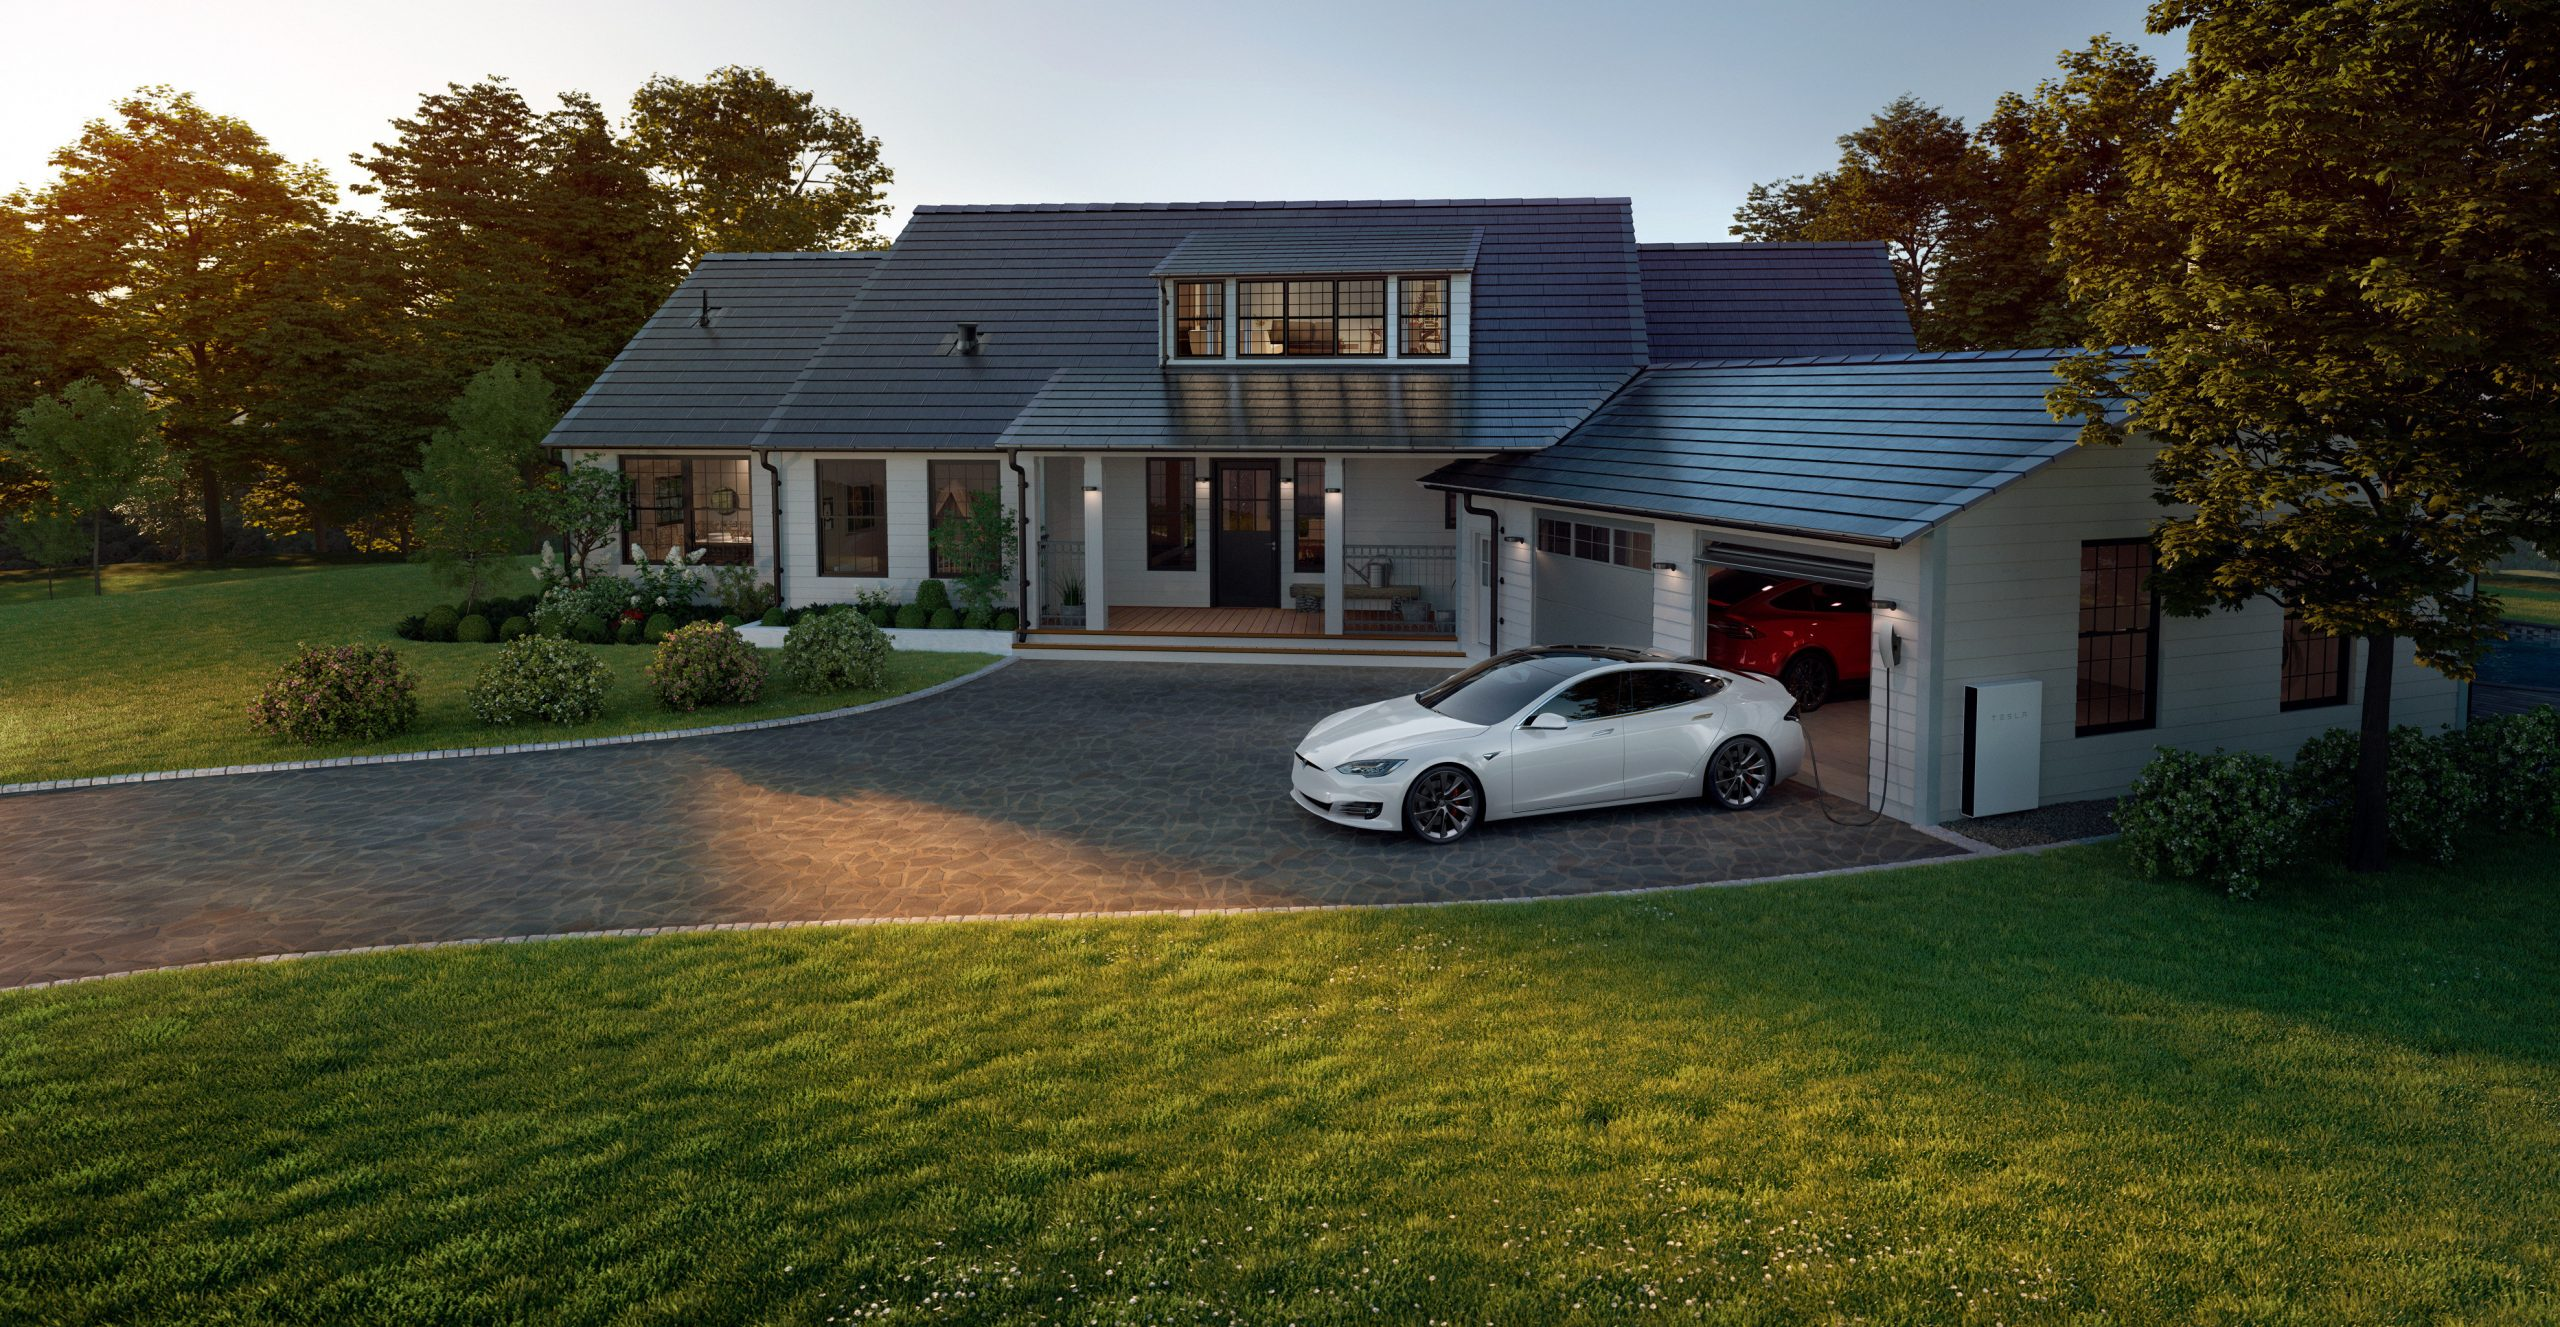 tesla-solar-roof-powerwall-battery-integration